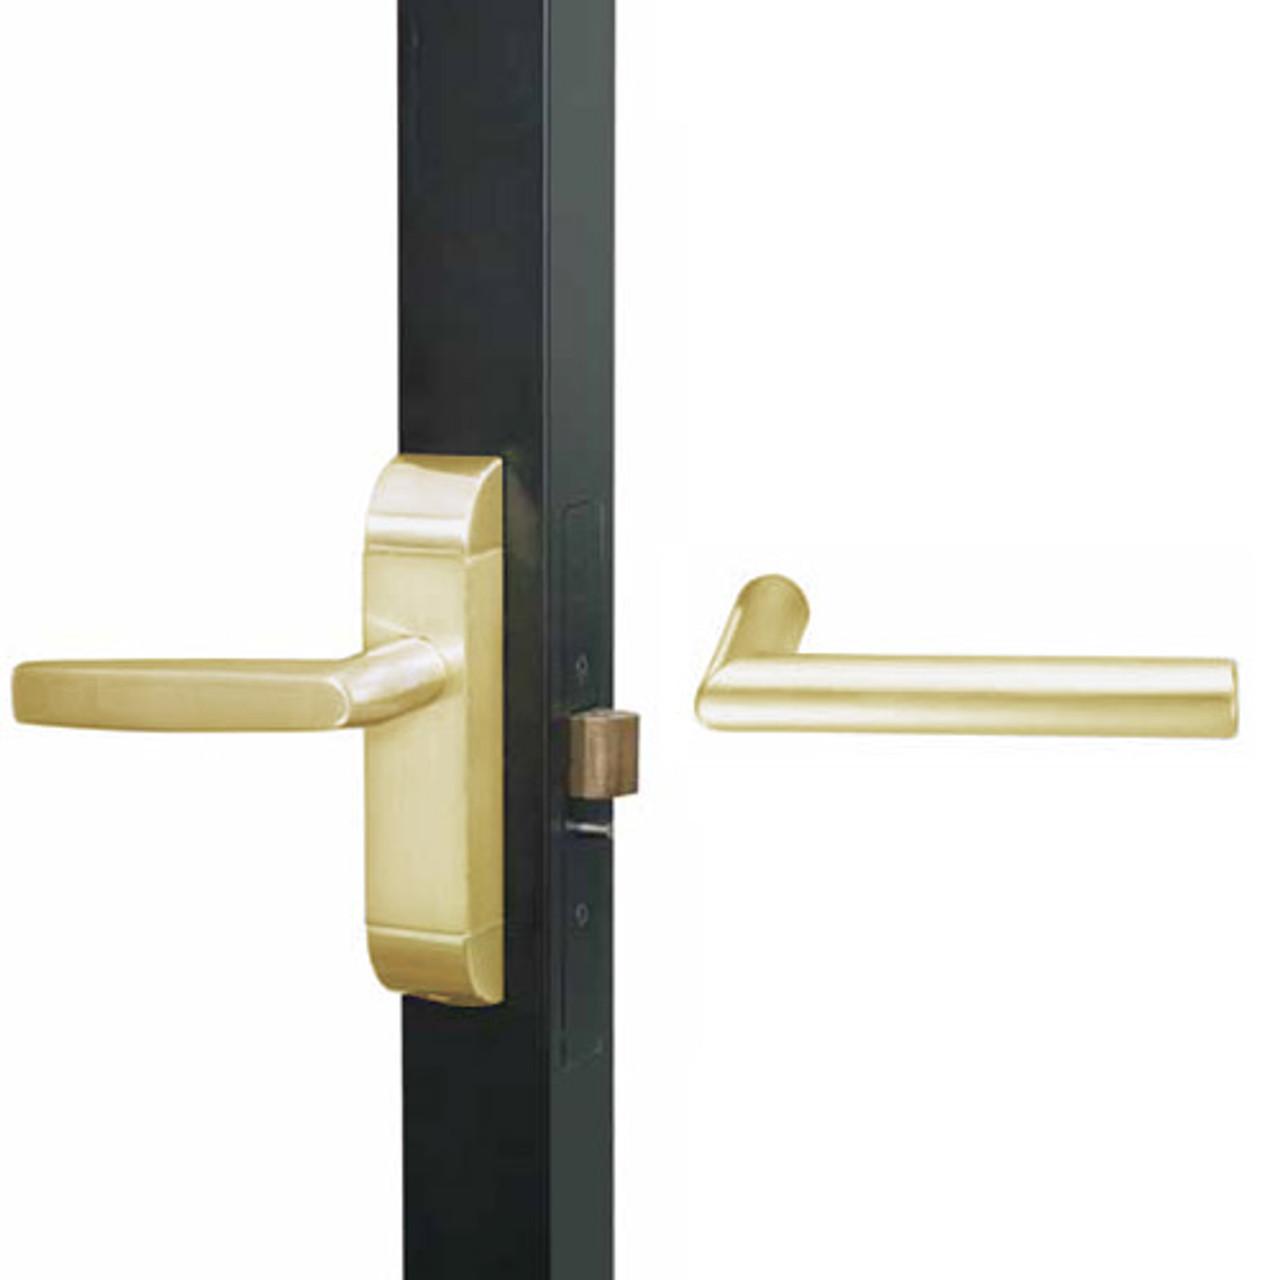 4600-MI-612-US4 Adams Rite MI Designer Deadlatch handle in Satin Brass Finish